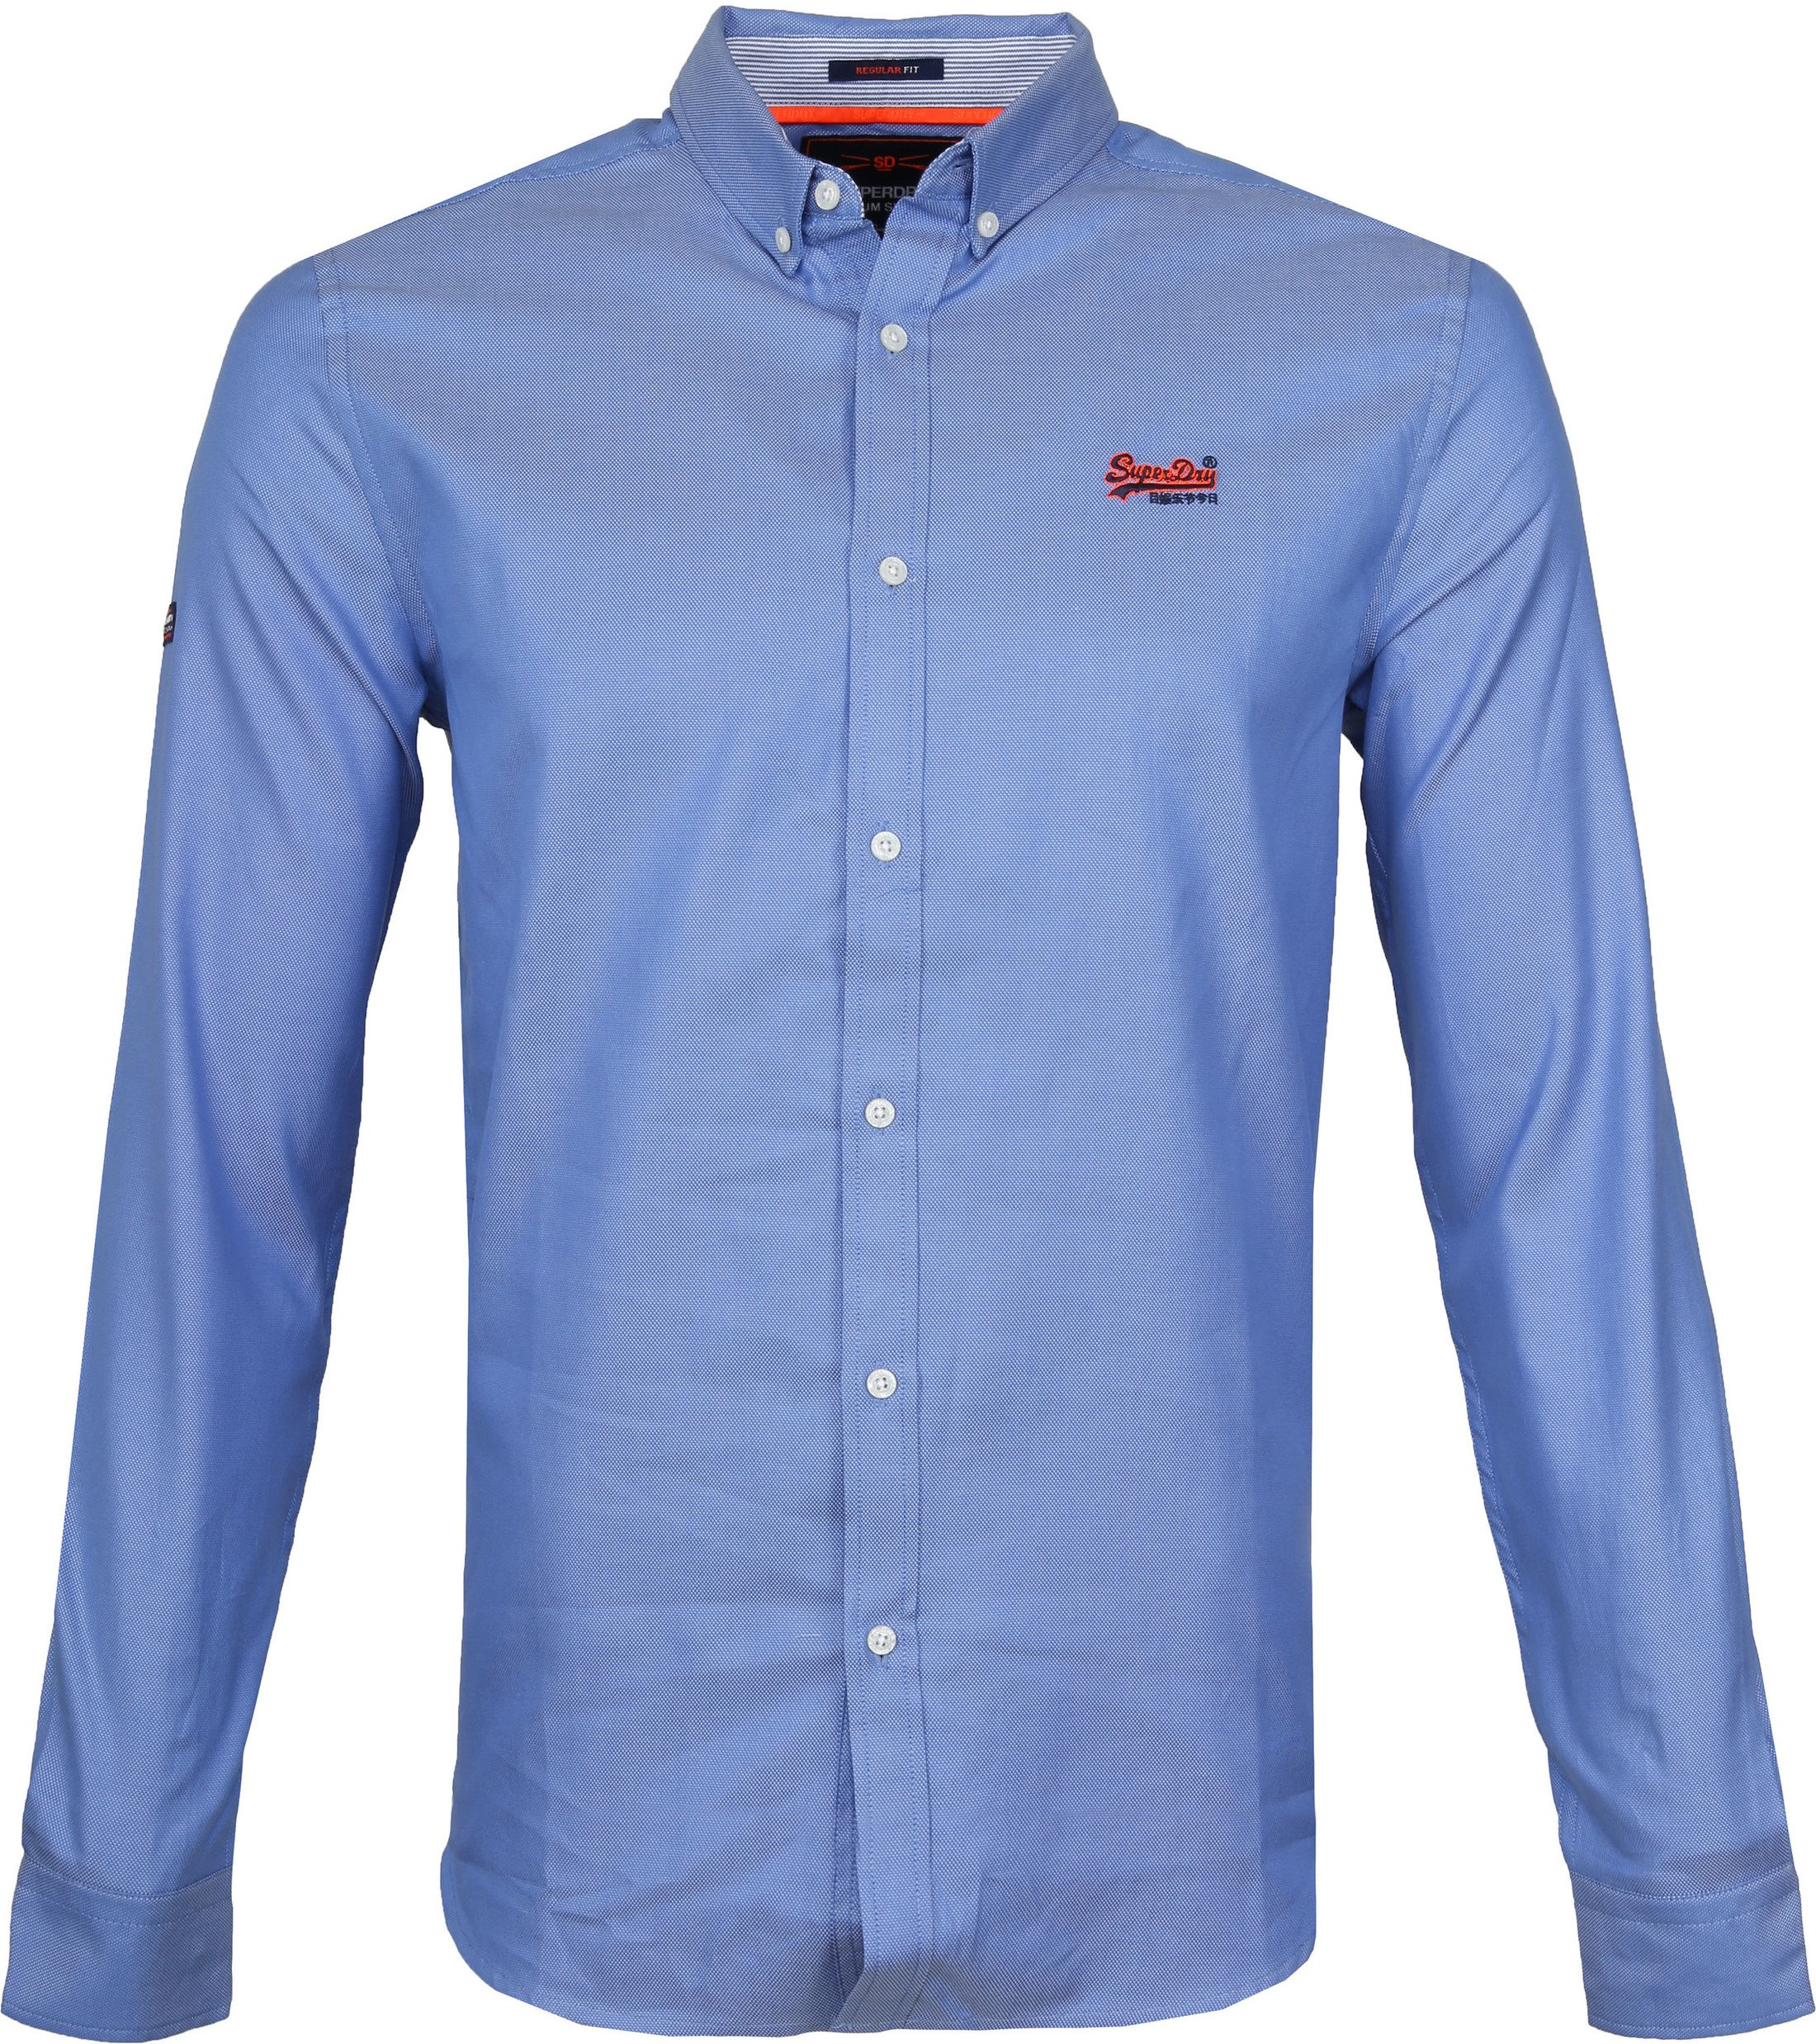 Superdry Overhemd Blauw foto 0